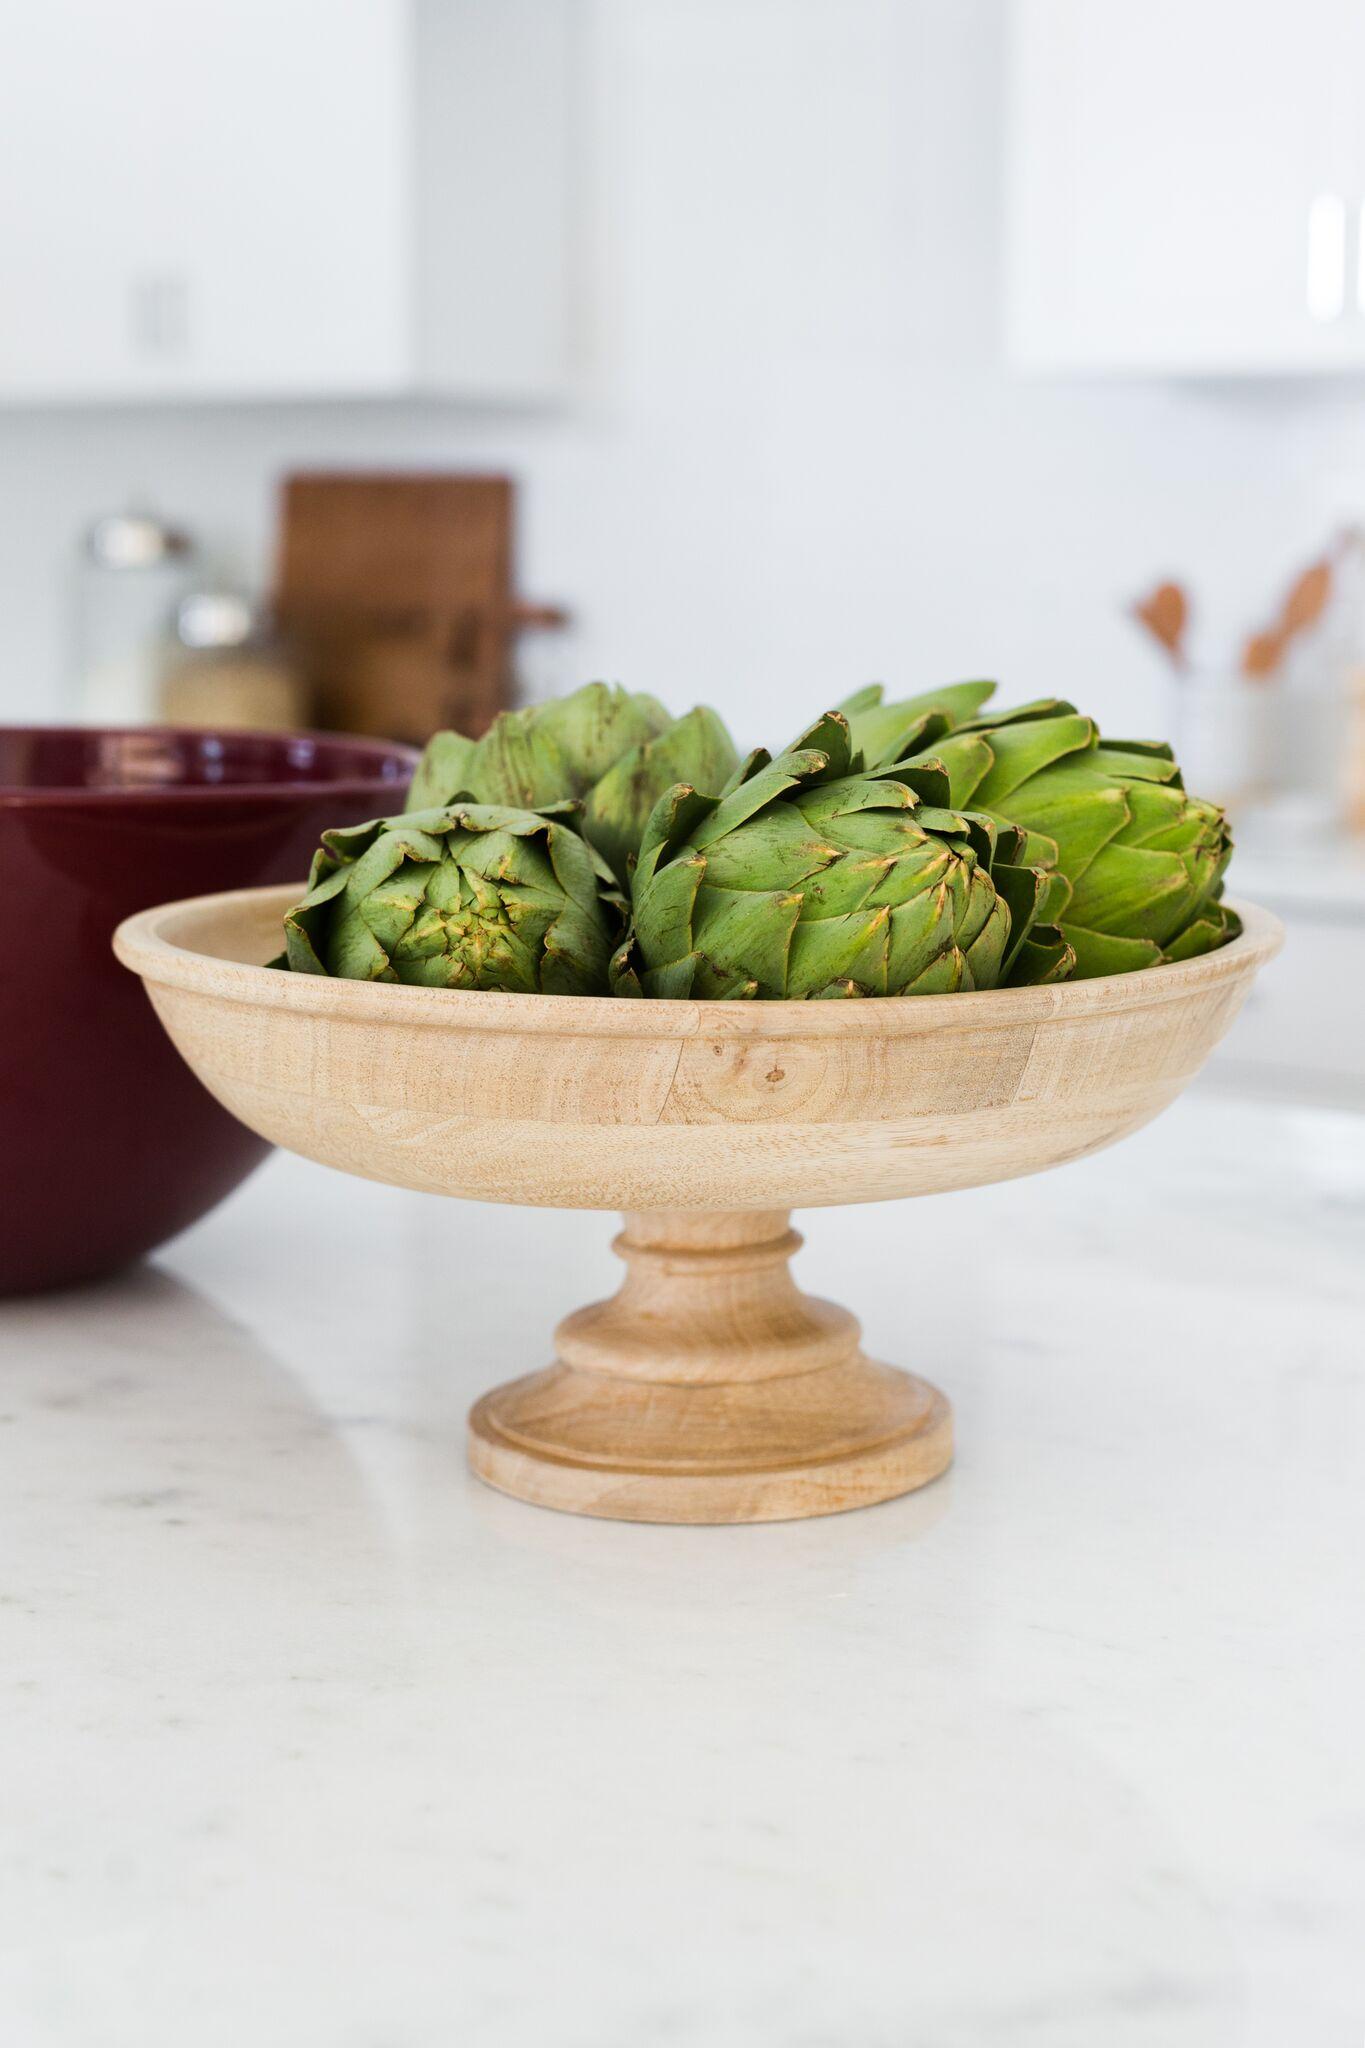 Bowl of artichokes on kitchen counter